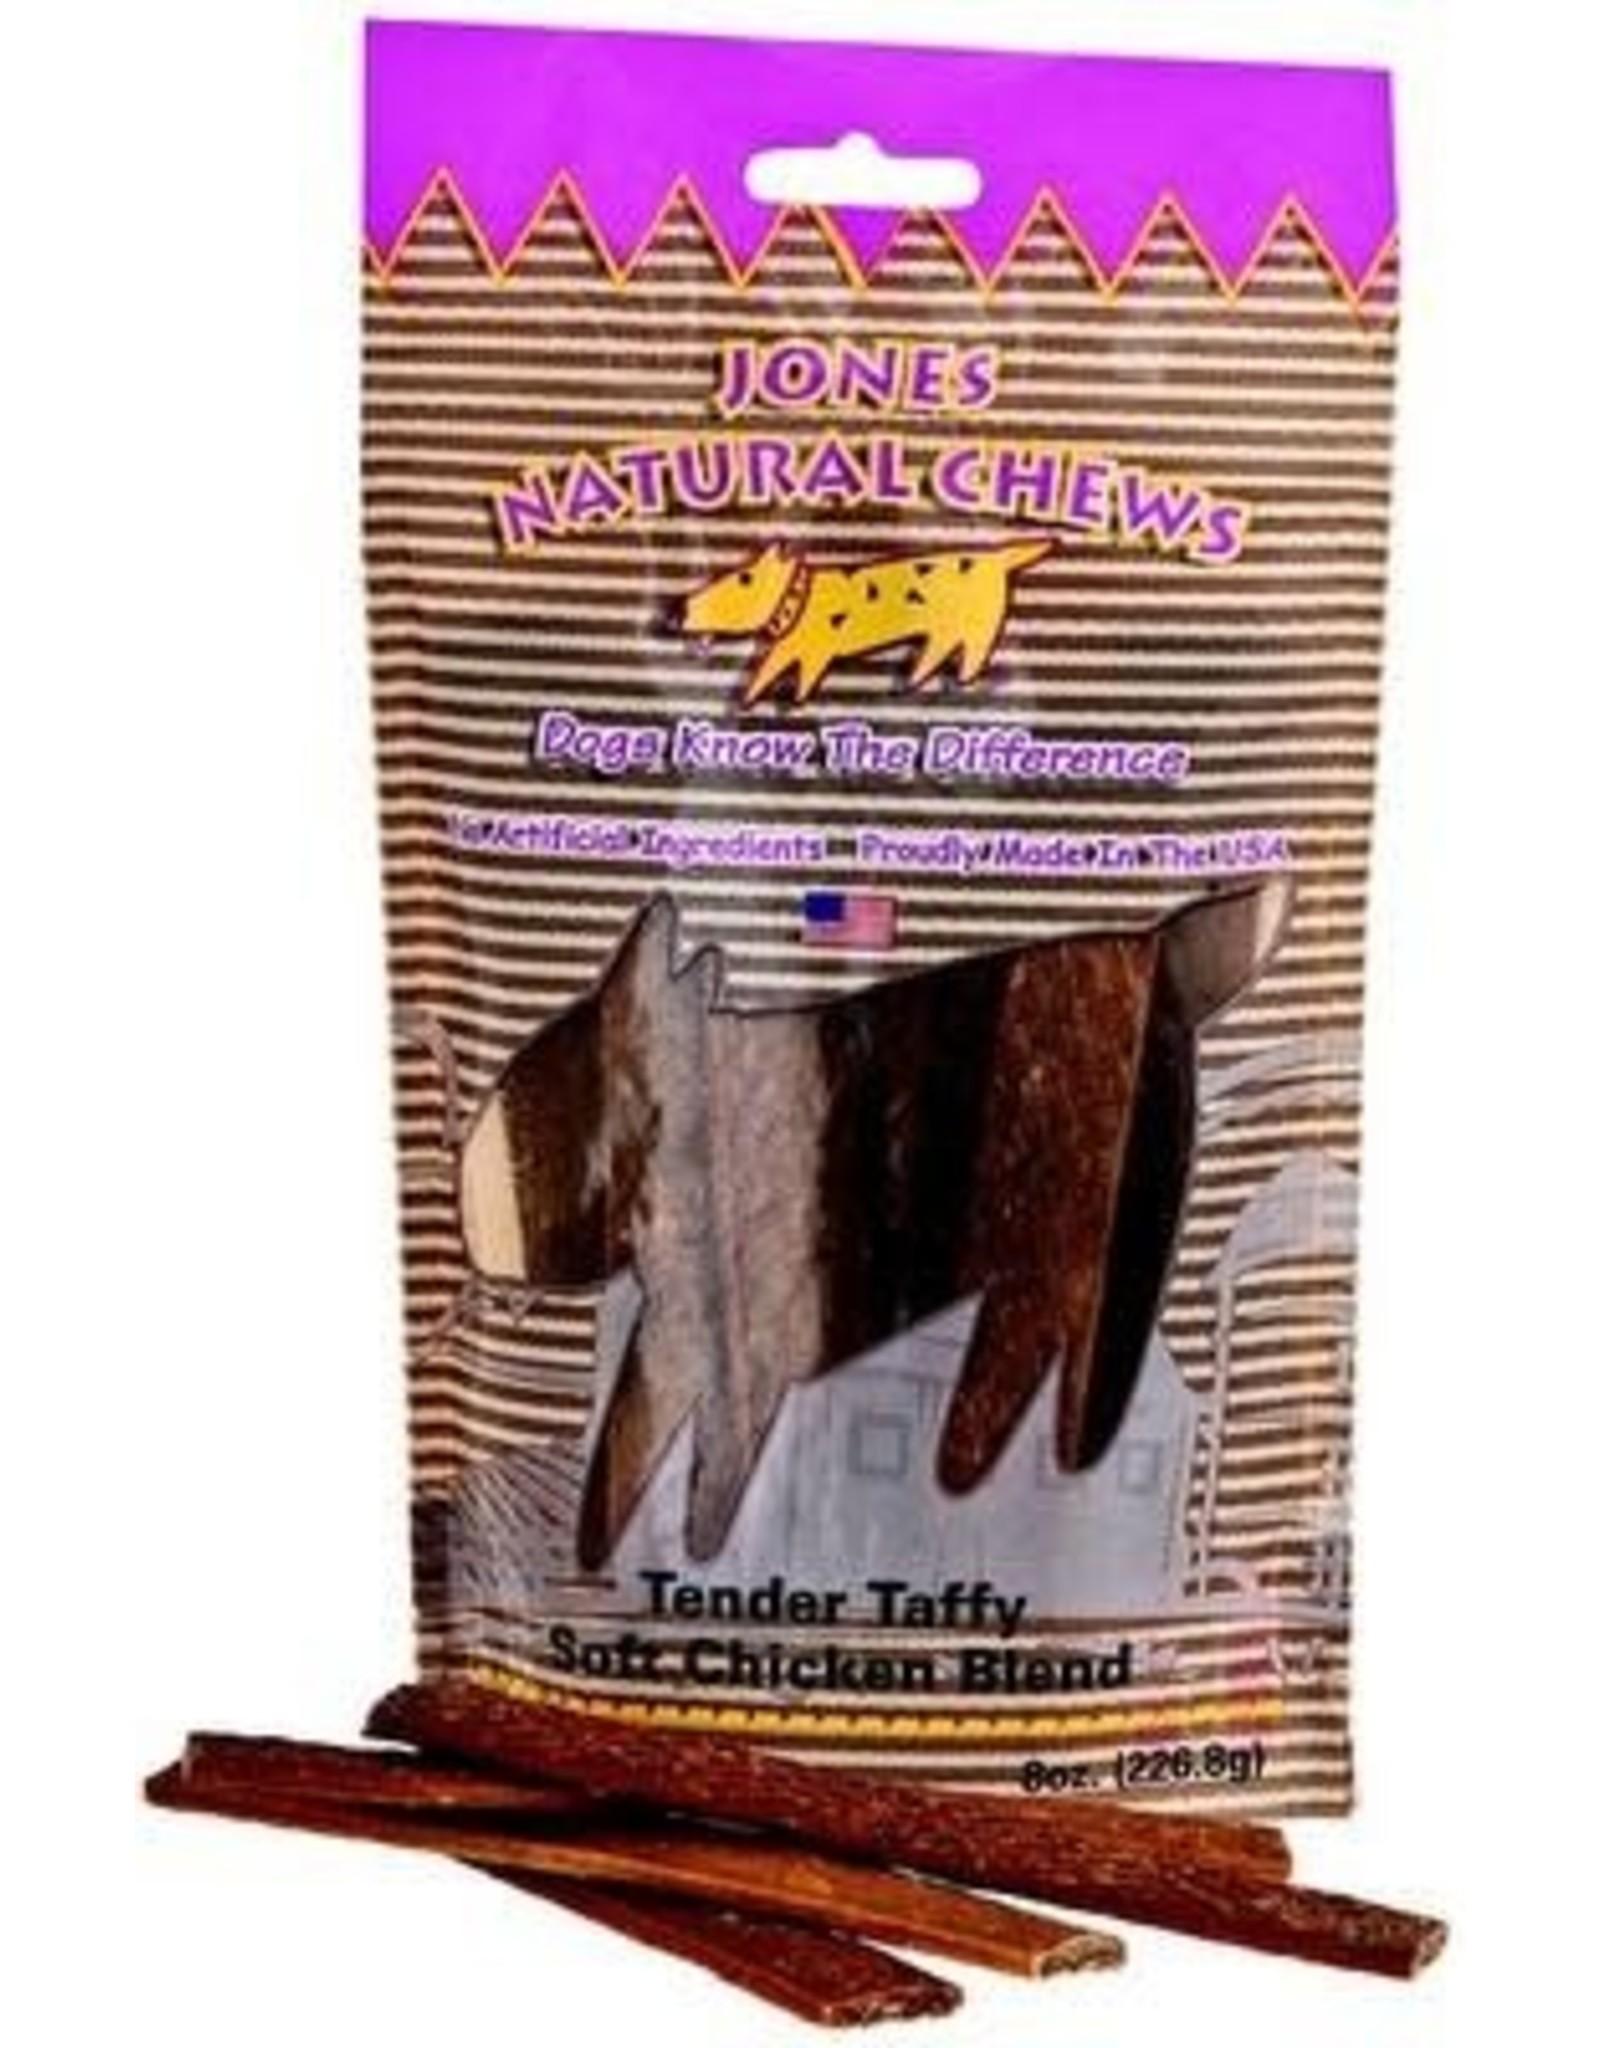 Jones Natural Chews JONES Chicken Blend Tender Taffy 8oz